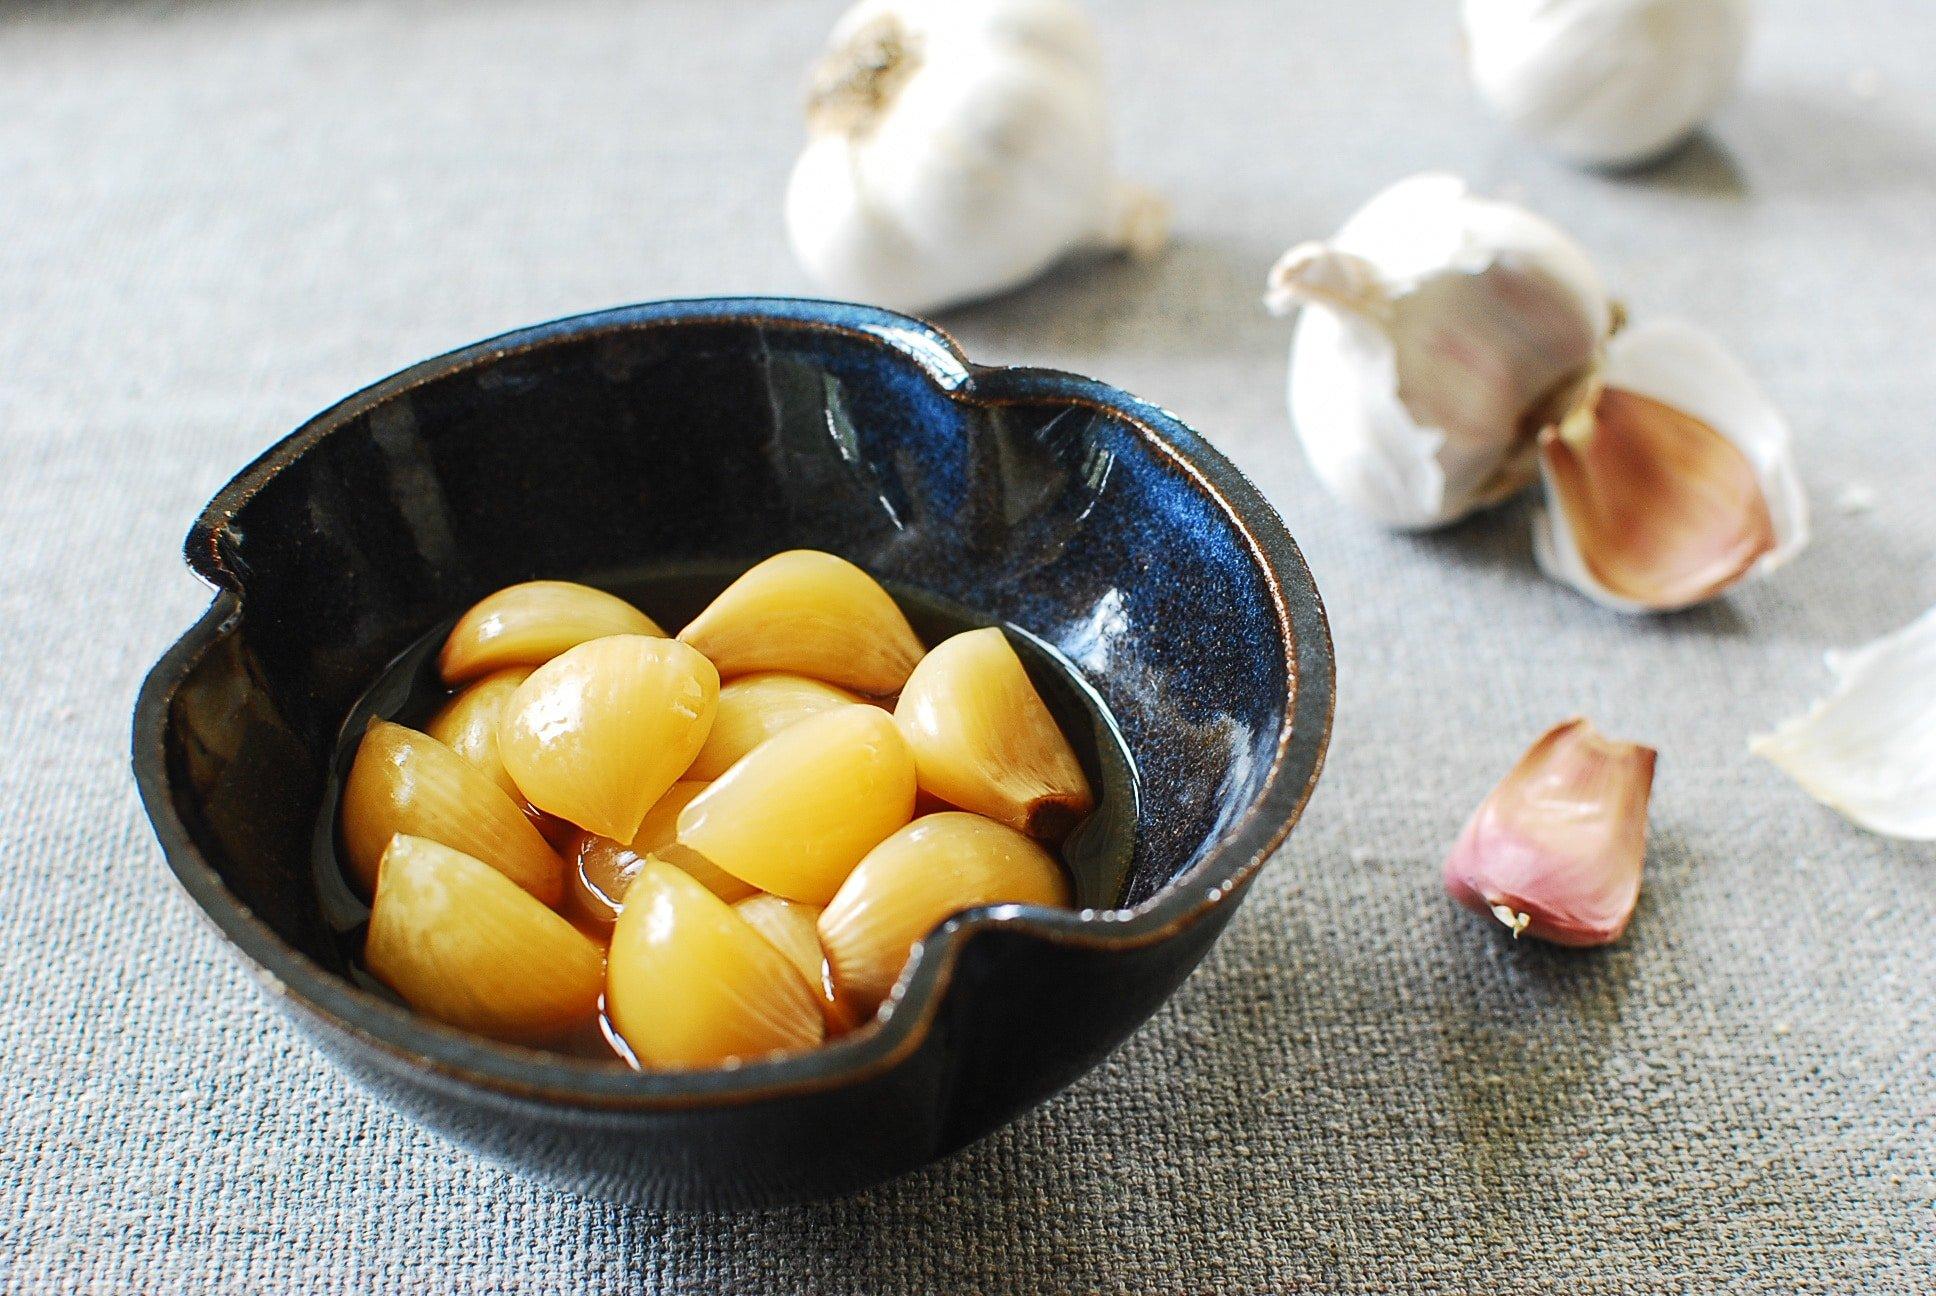 DSC 1715 1 - Pickled Garlic (Maneul Jangajji)